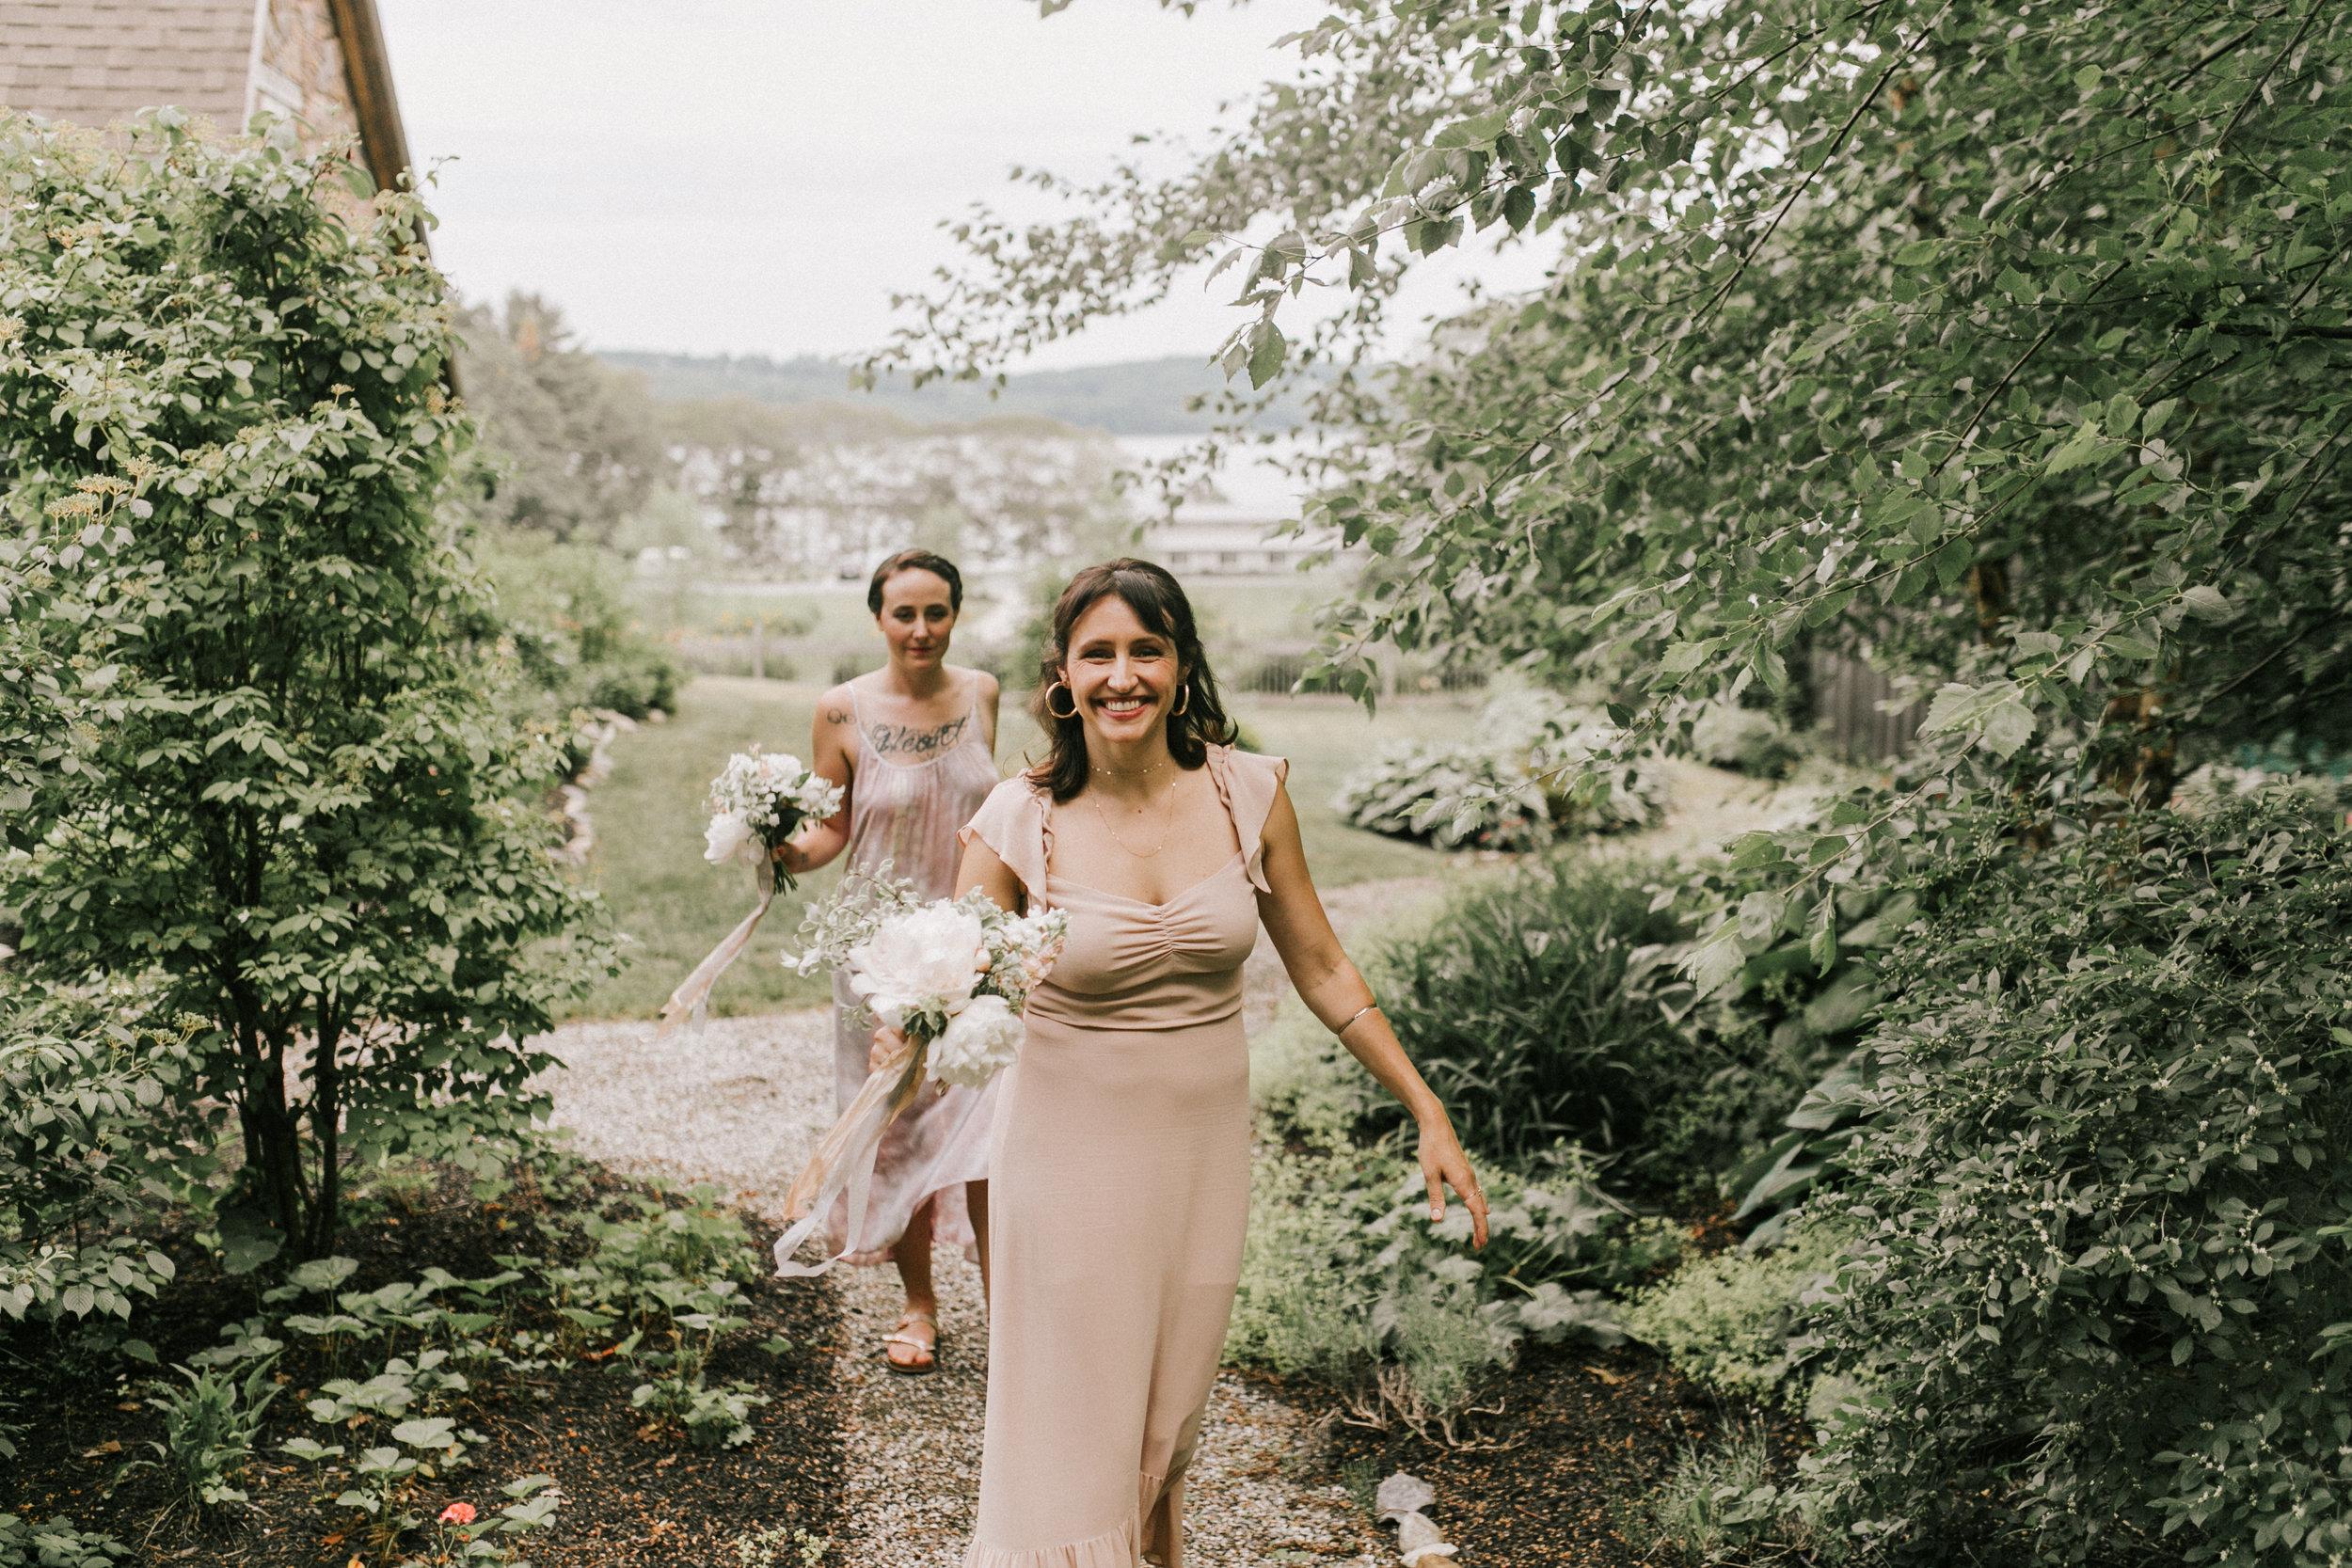 Watershed_Floral_Marianmade_Farm_Wedding_JamieMercurioPhoto2018-106.jpg